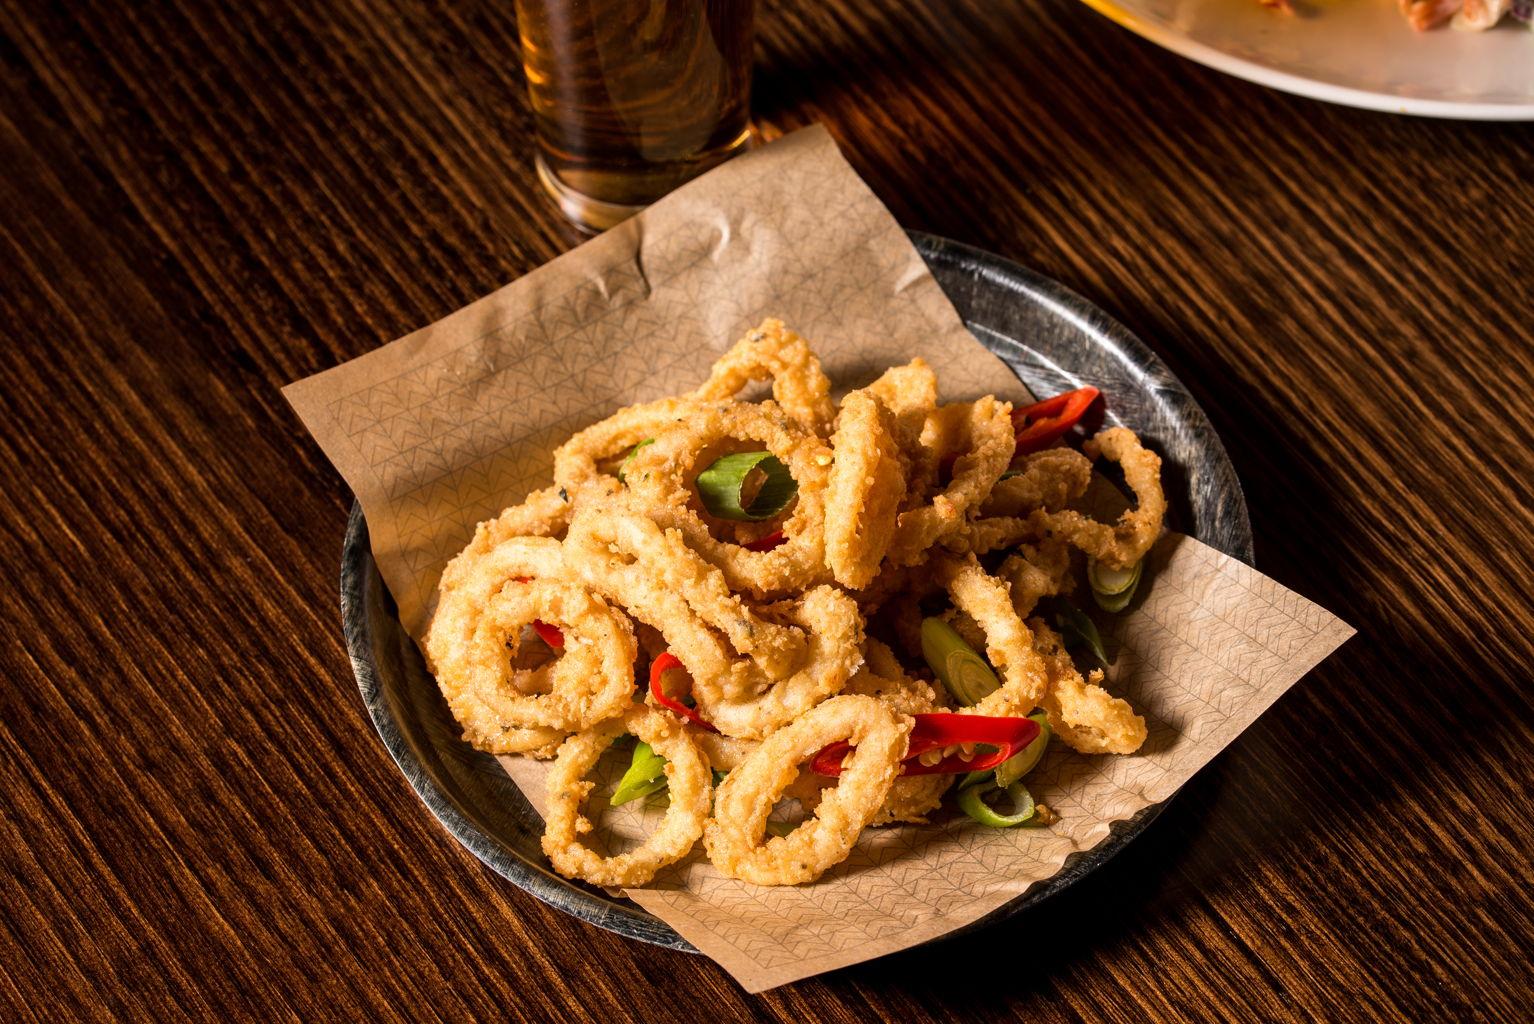 victoria-inn-food (3).jpg